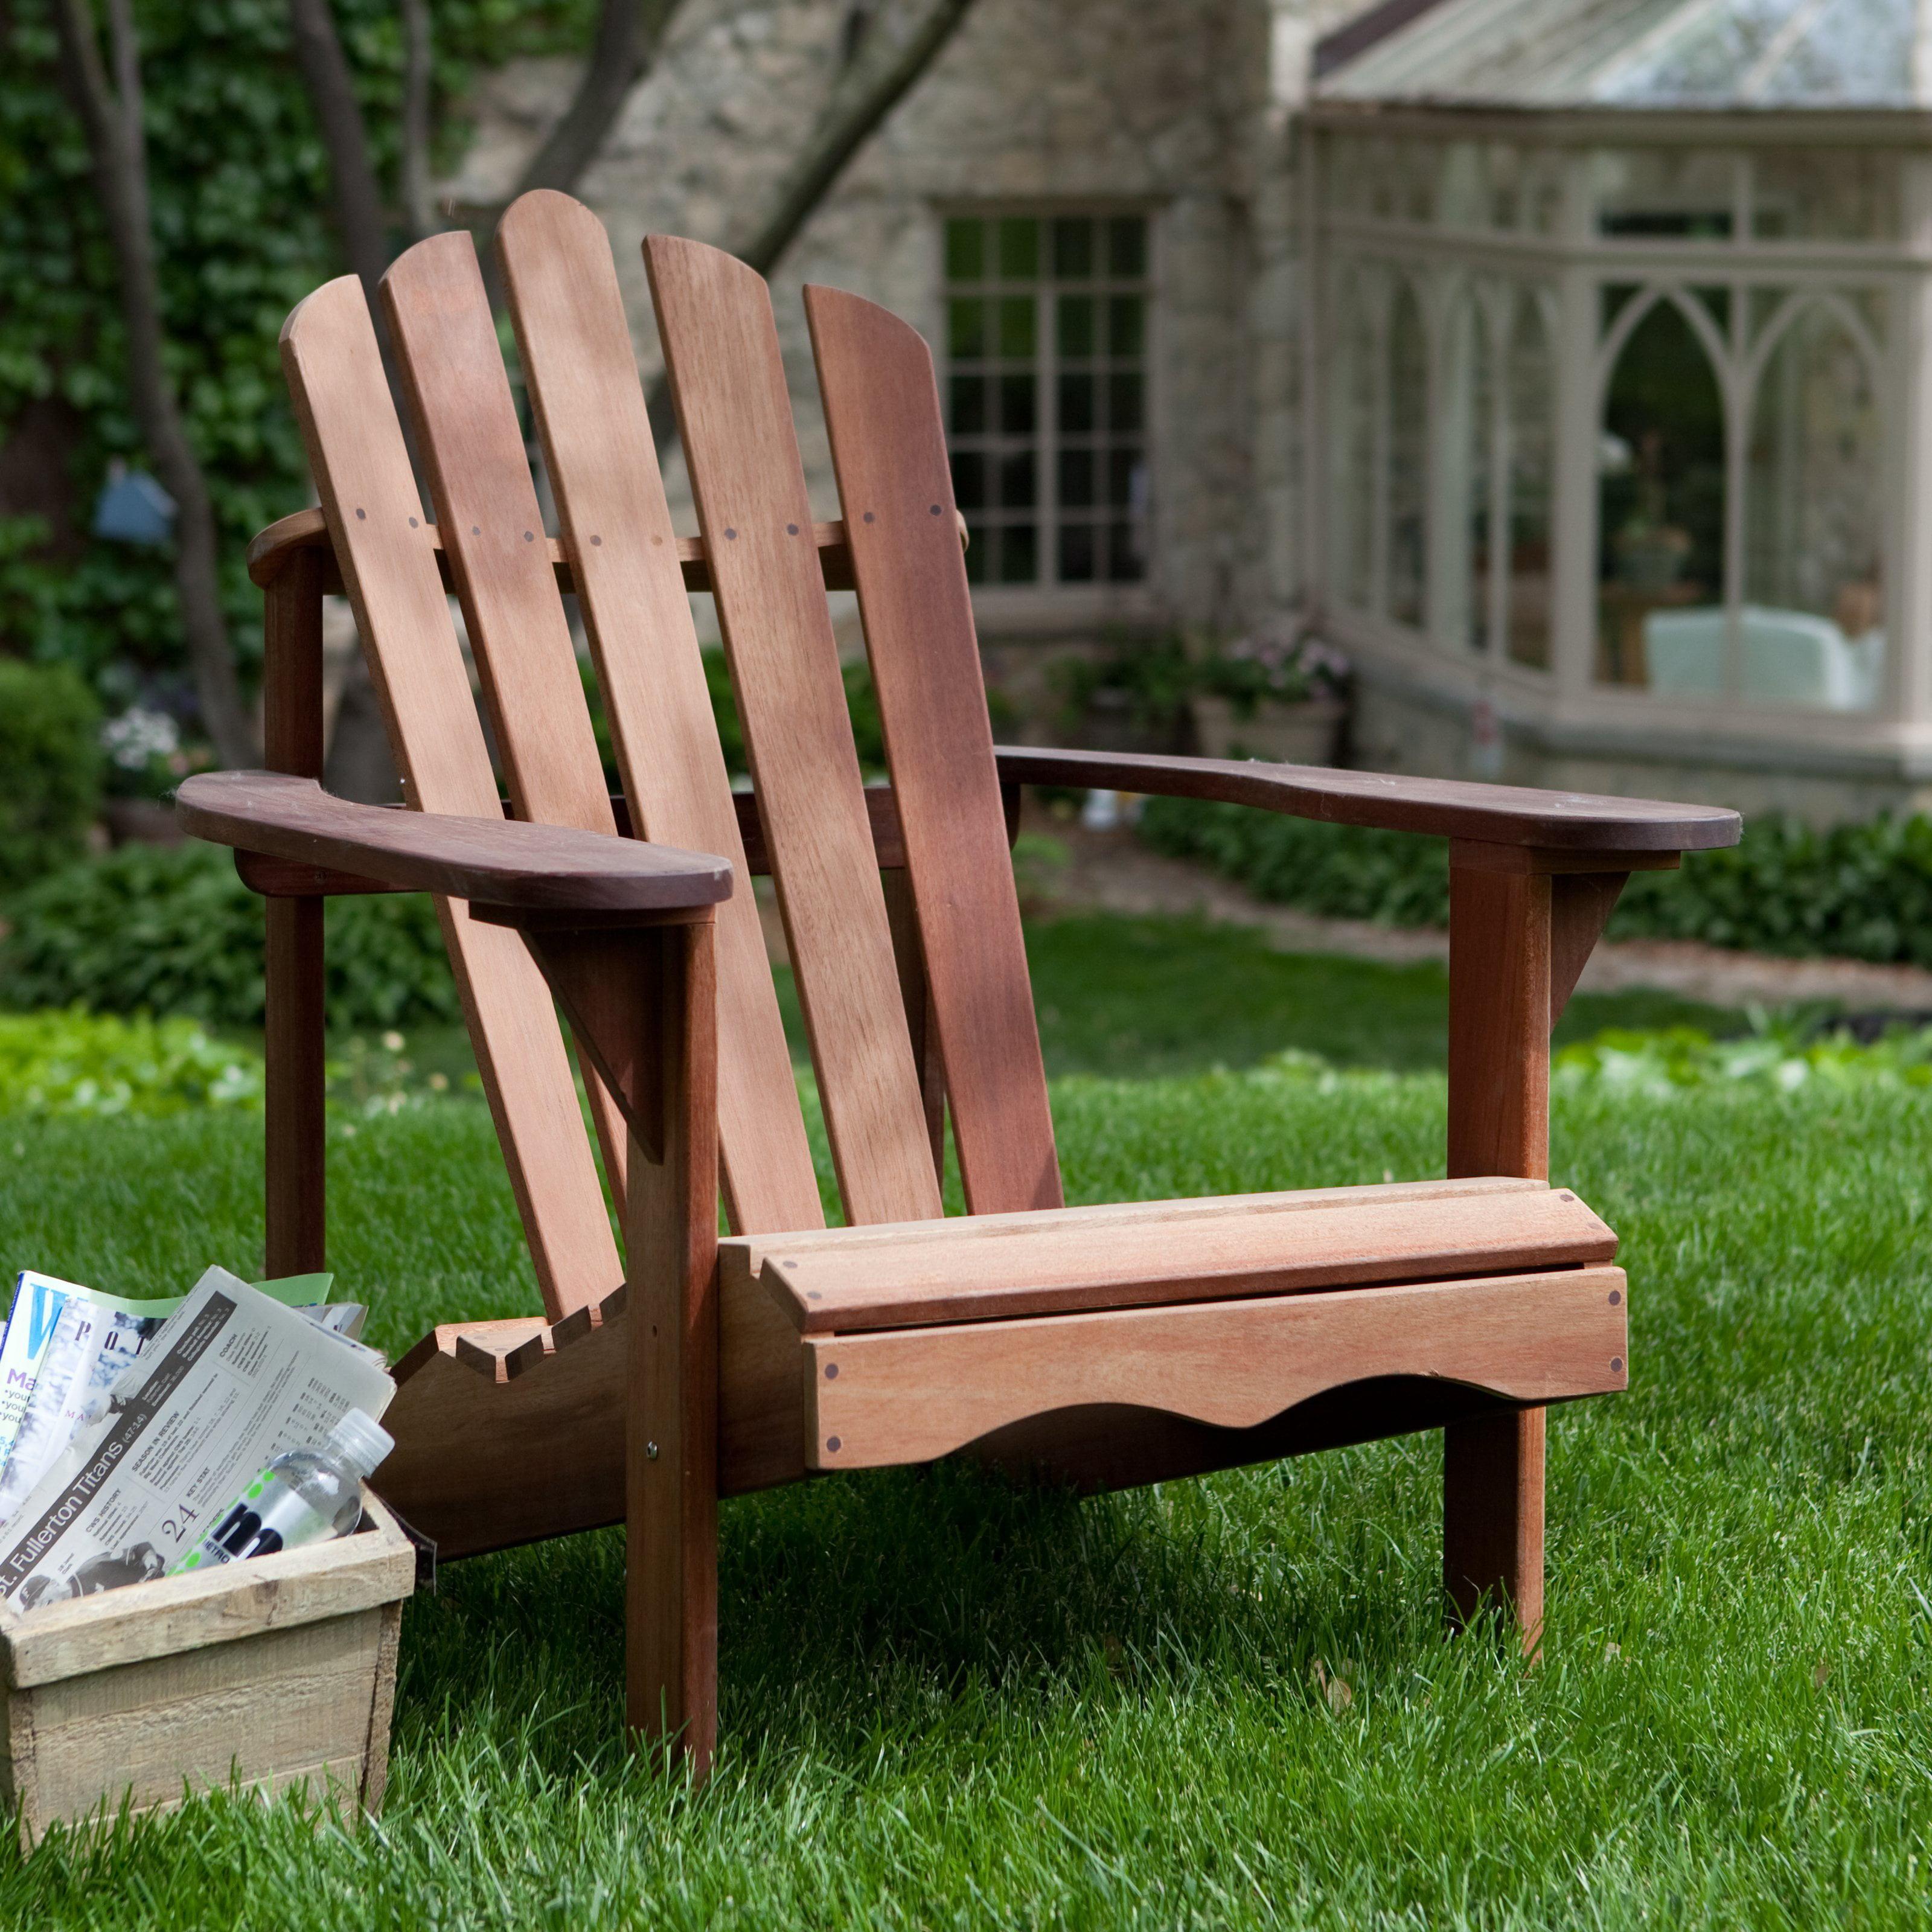 Belham Living Richmond Deluxe Shorea Wood Adirondack Chair by